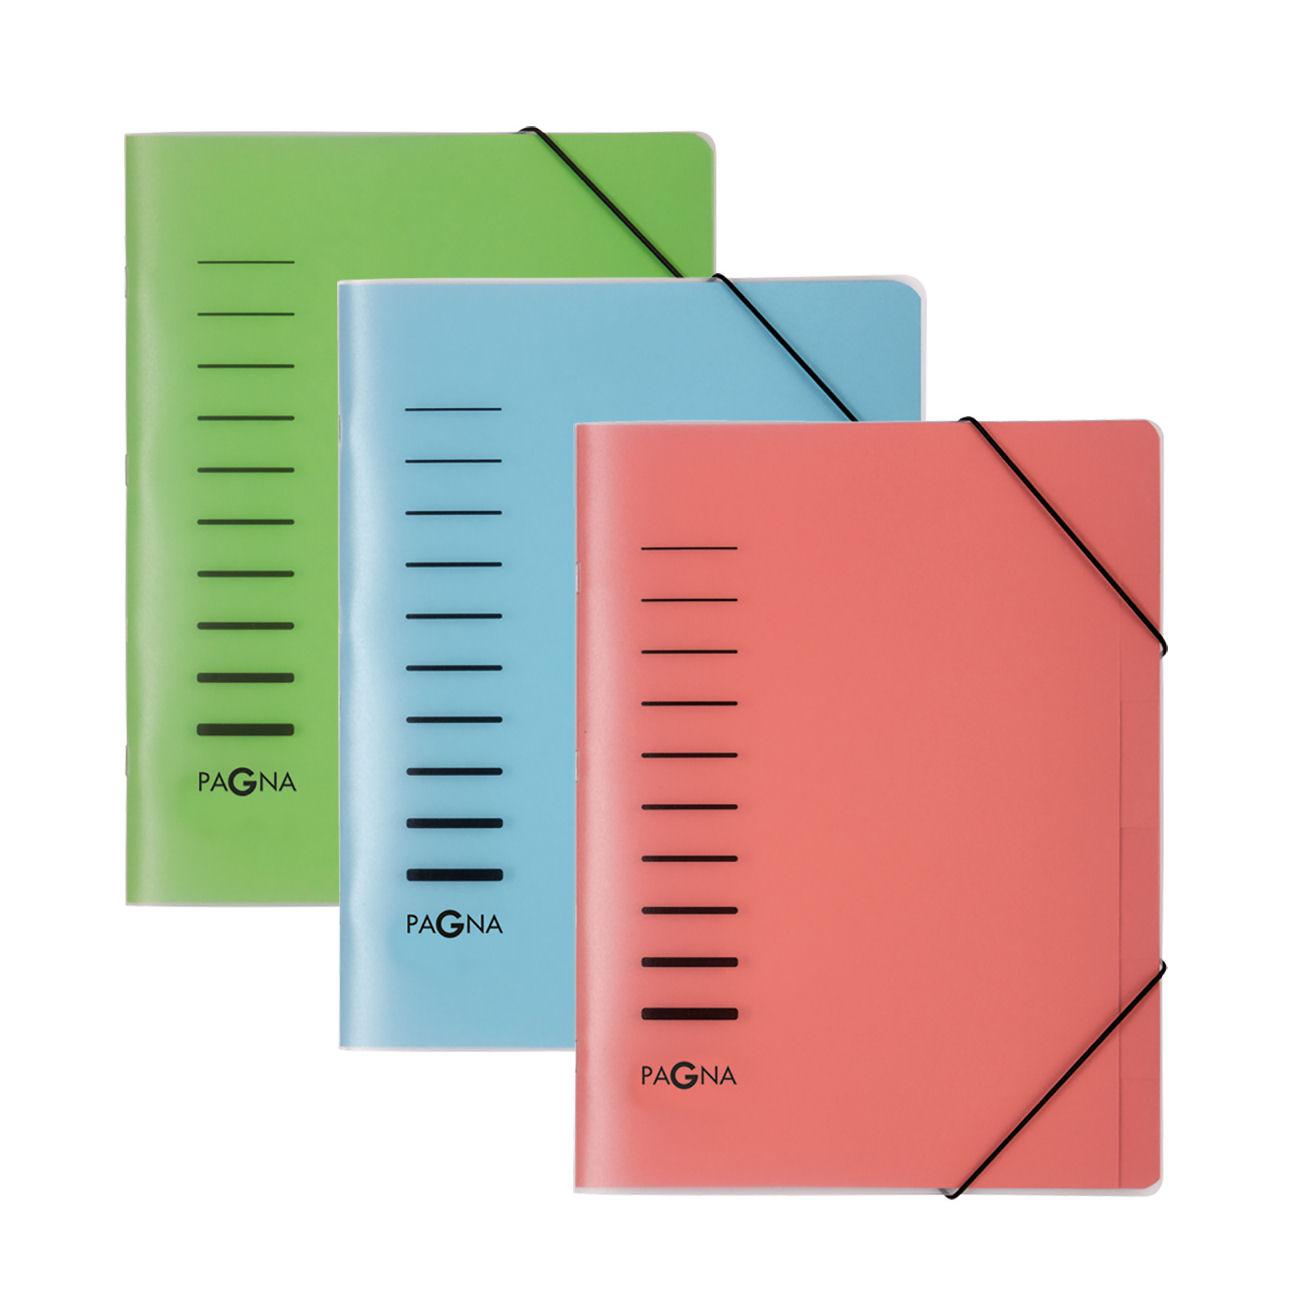 Pagna Classic 6 Part File Elastic Corner Straps Polypropylene A4 Blue Ref 4005602 [Pack 5]